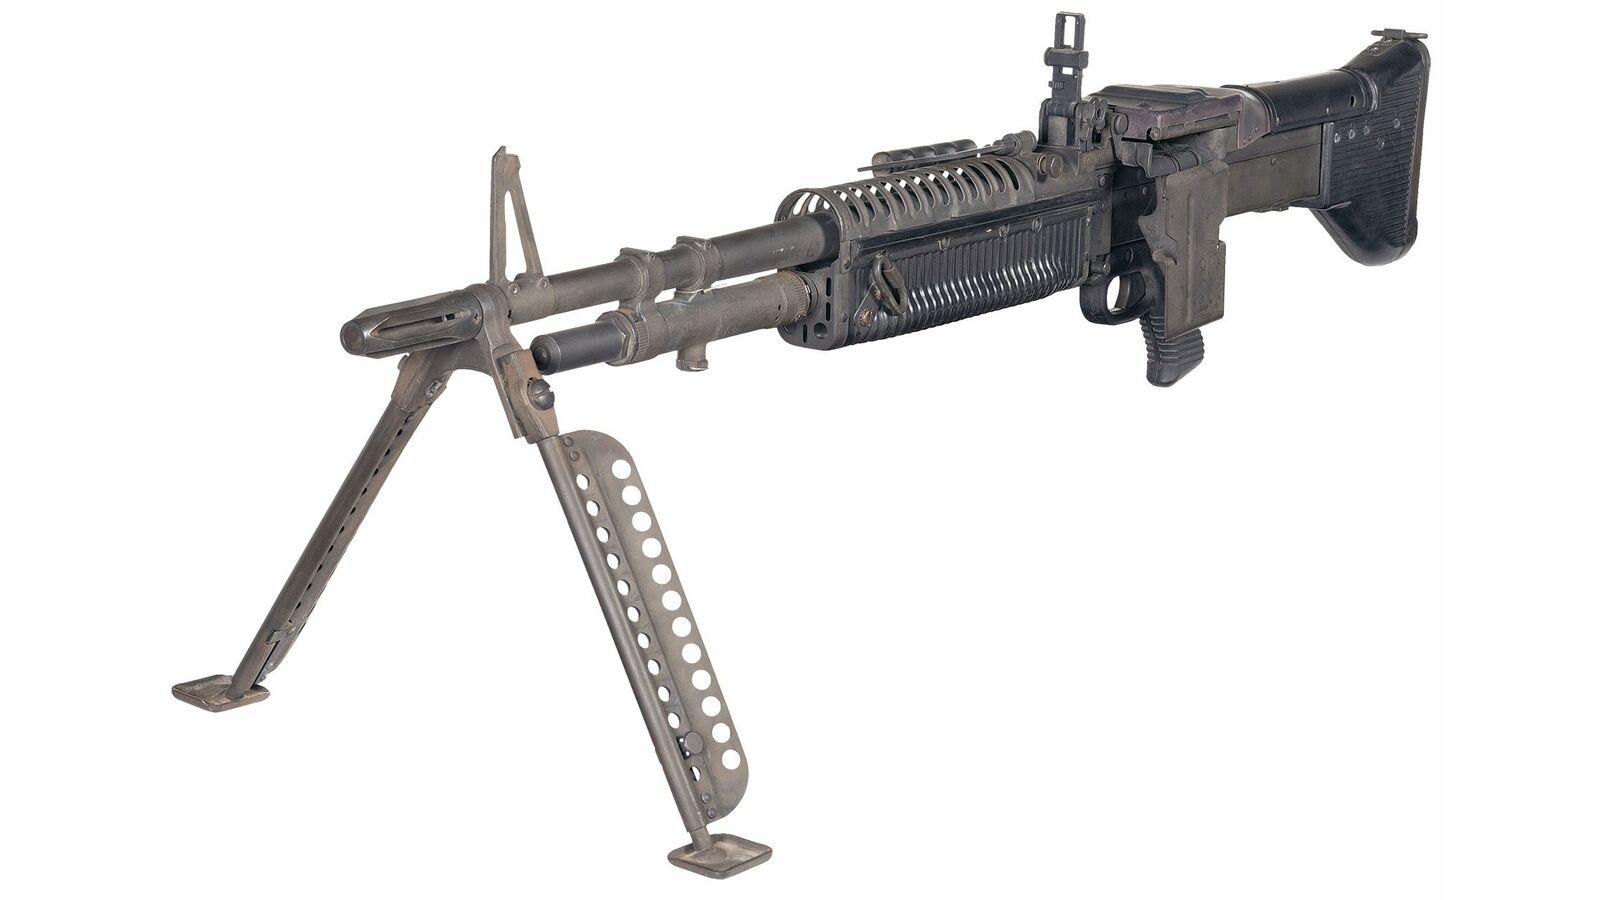 M60 For Sale >> Fully Automatic Class Iii Nfa Registered M60 Medium Machine Gun